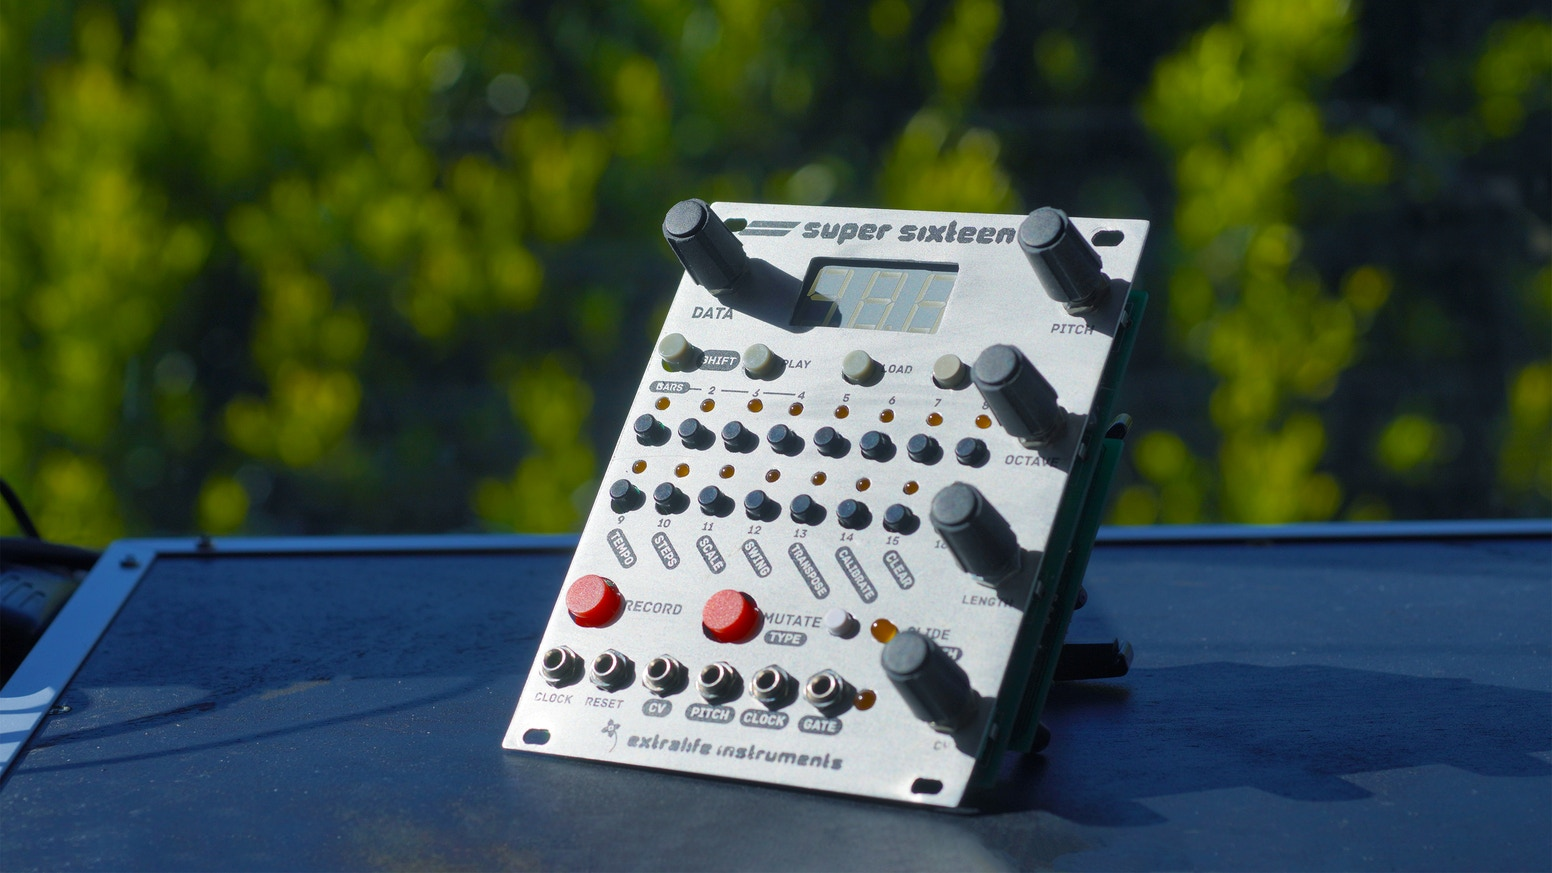 A new digital sequencer for Eurorack modular synths